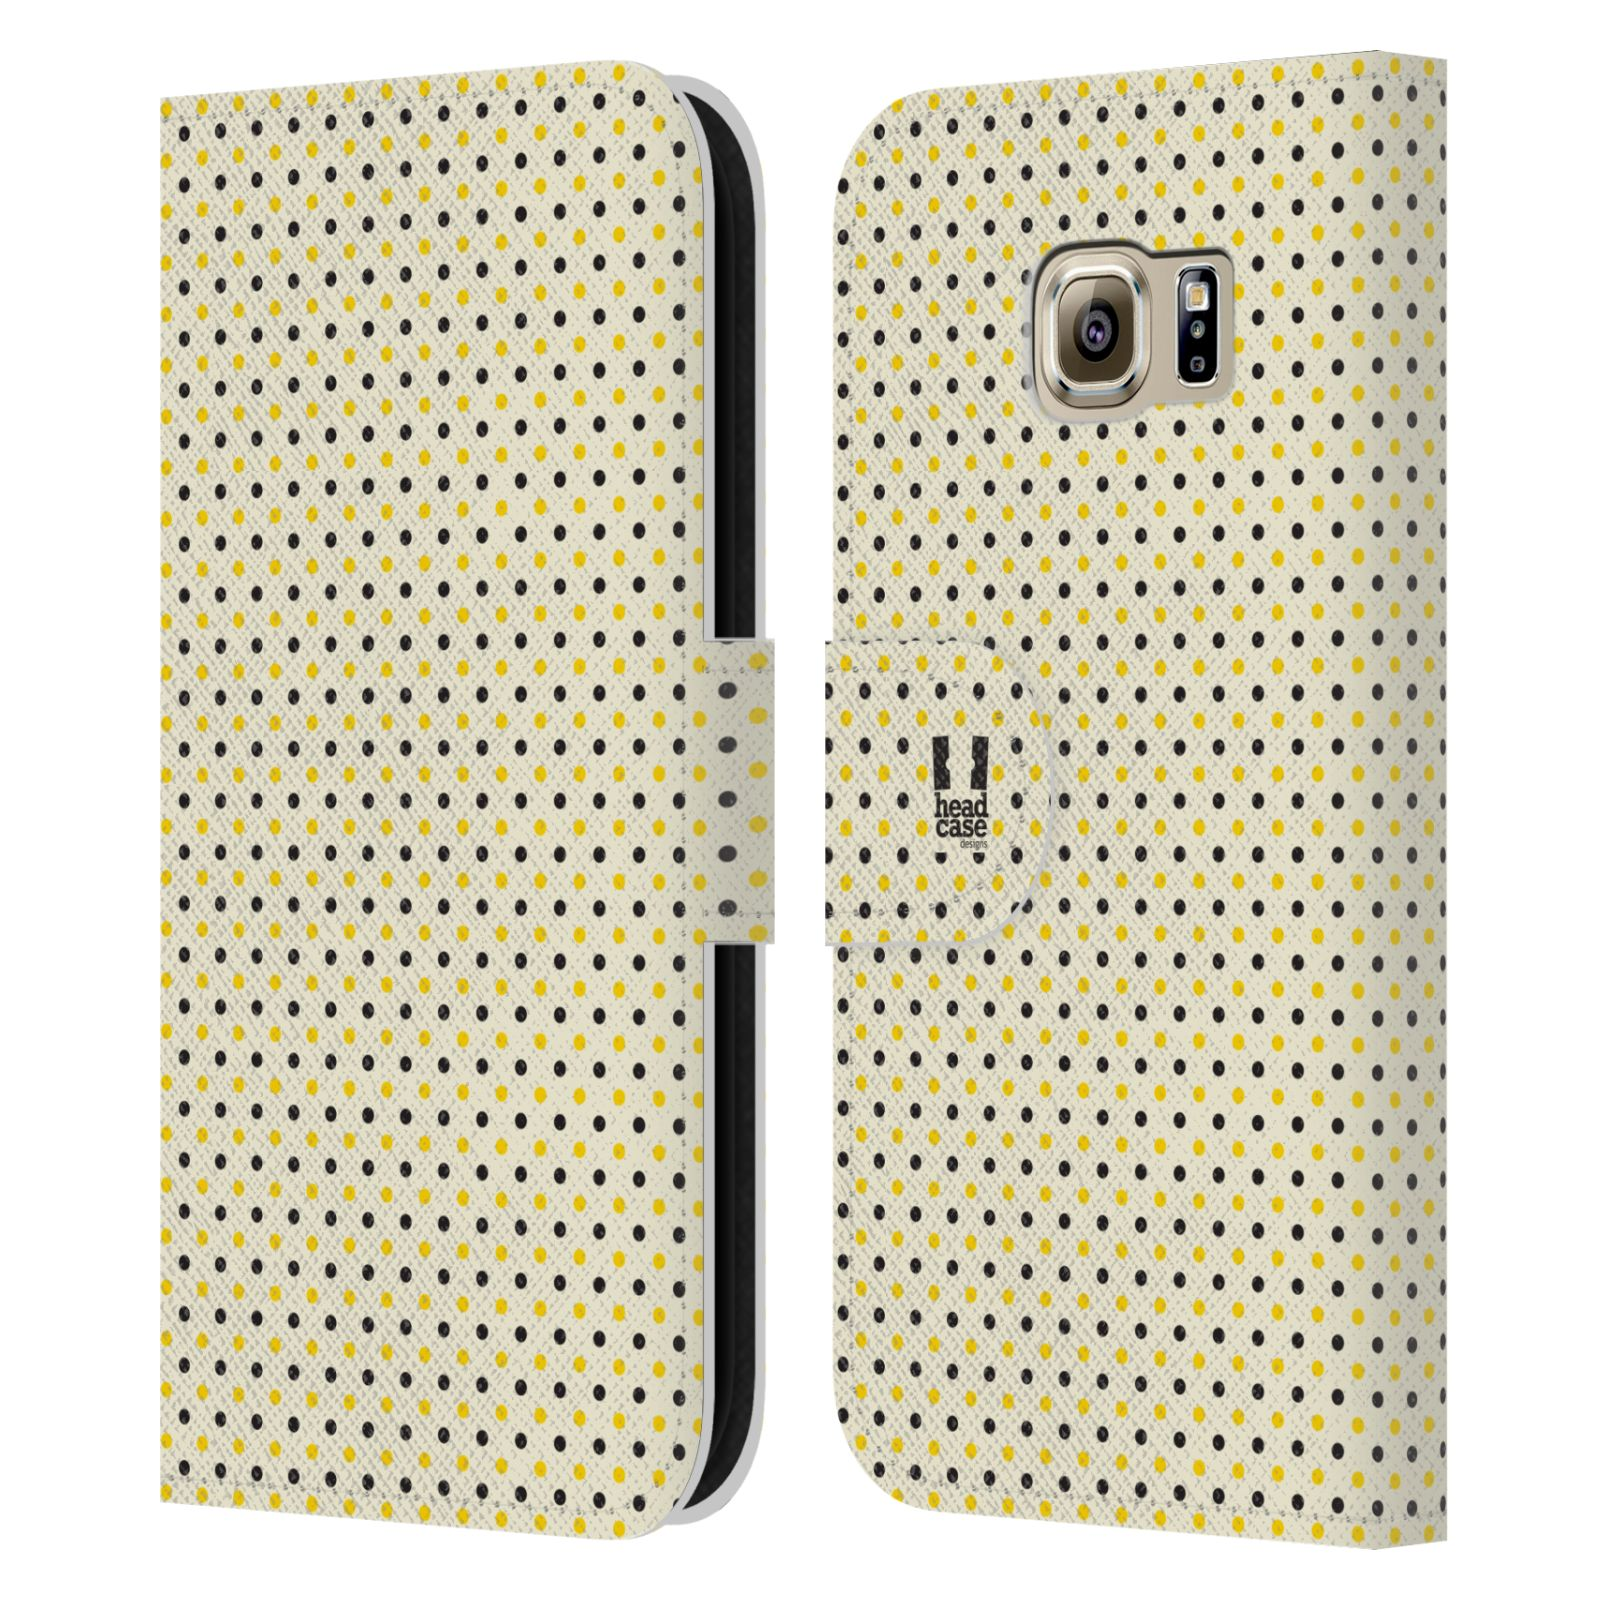 HEAD CASE Flipové pouzdro pro mobil Samsung Galaxy S6 (G9200) VČELÍ VZOR tečky a puntíky